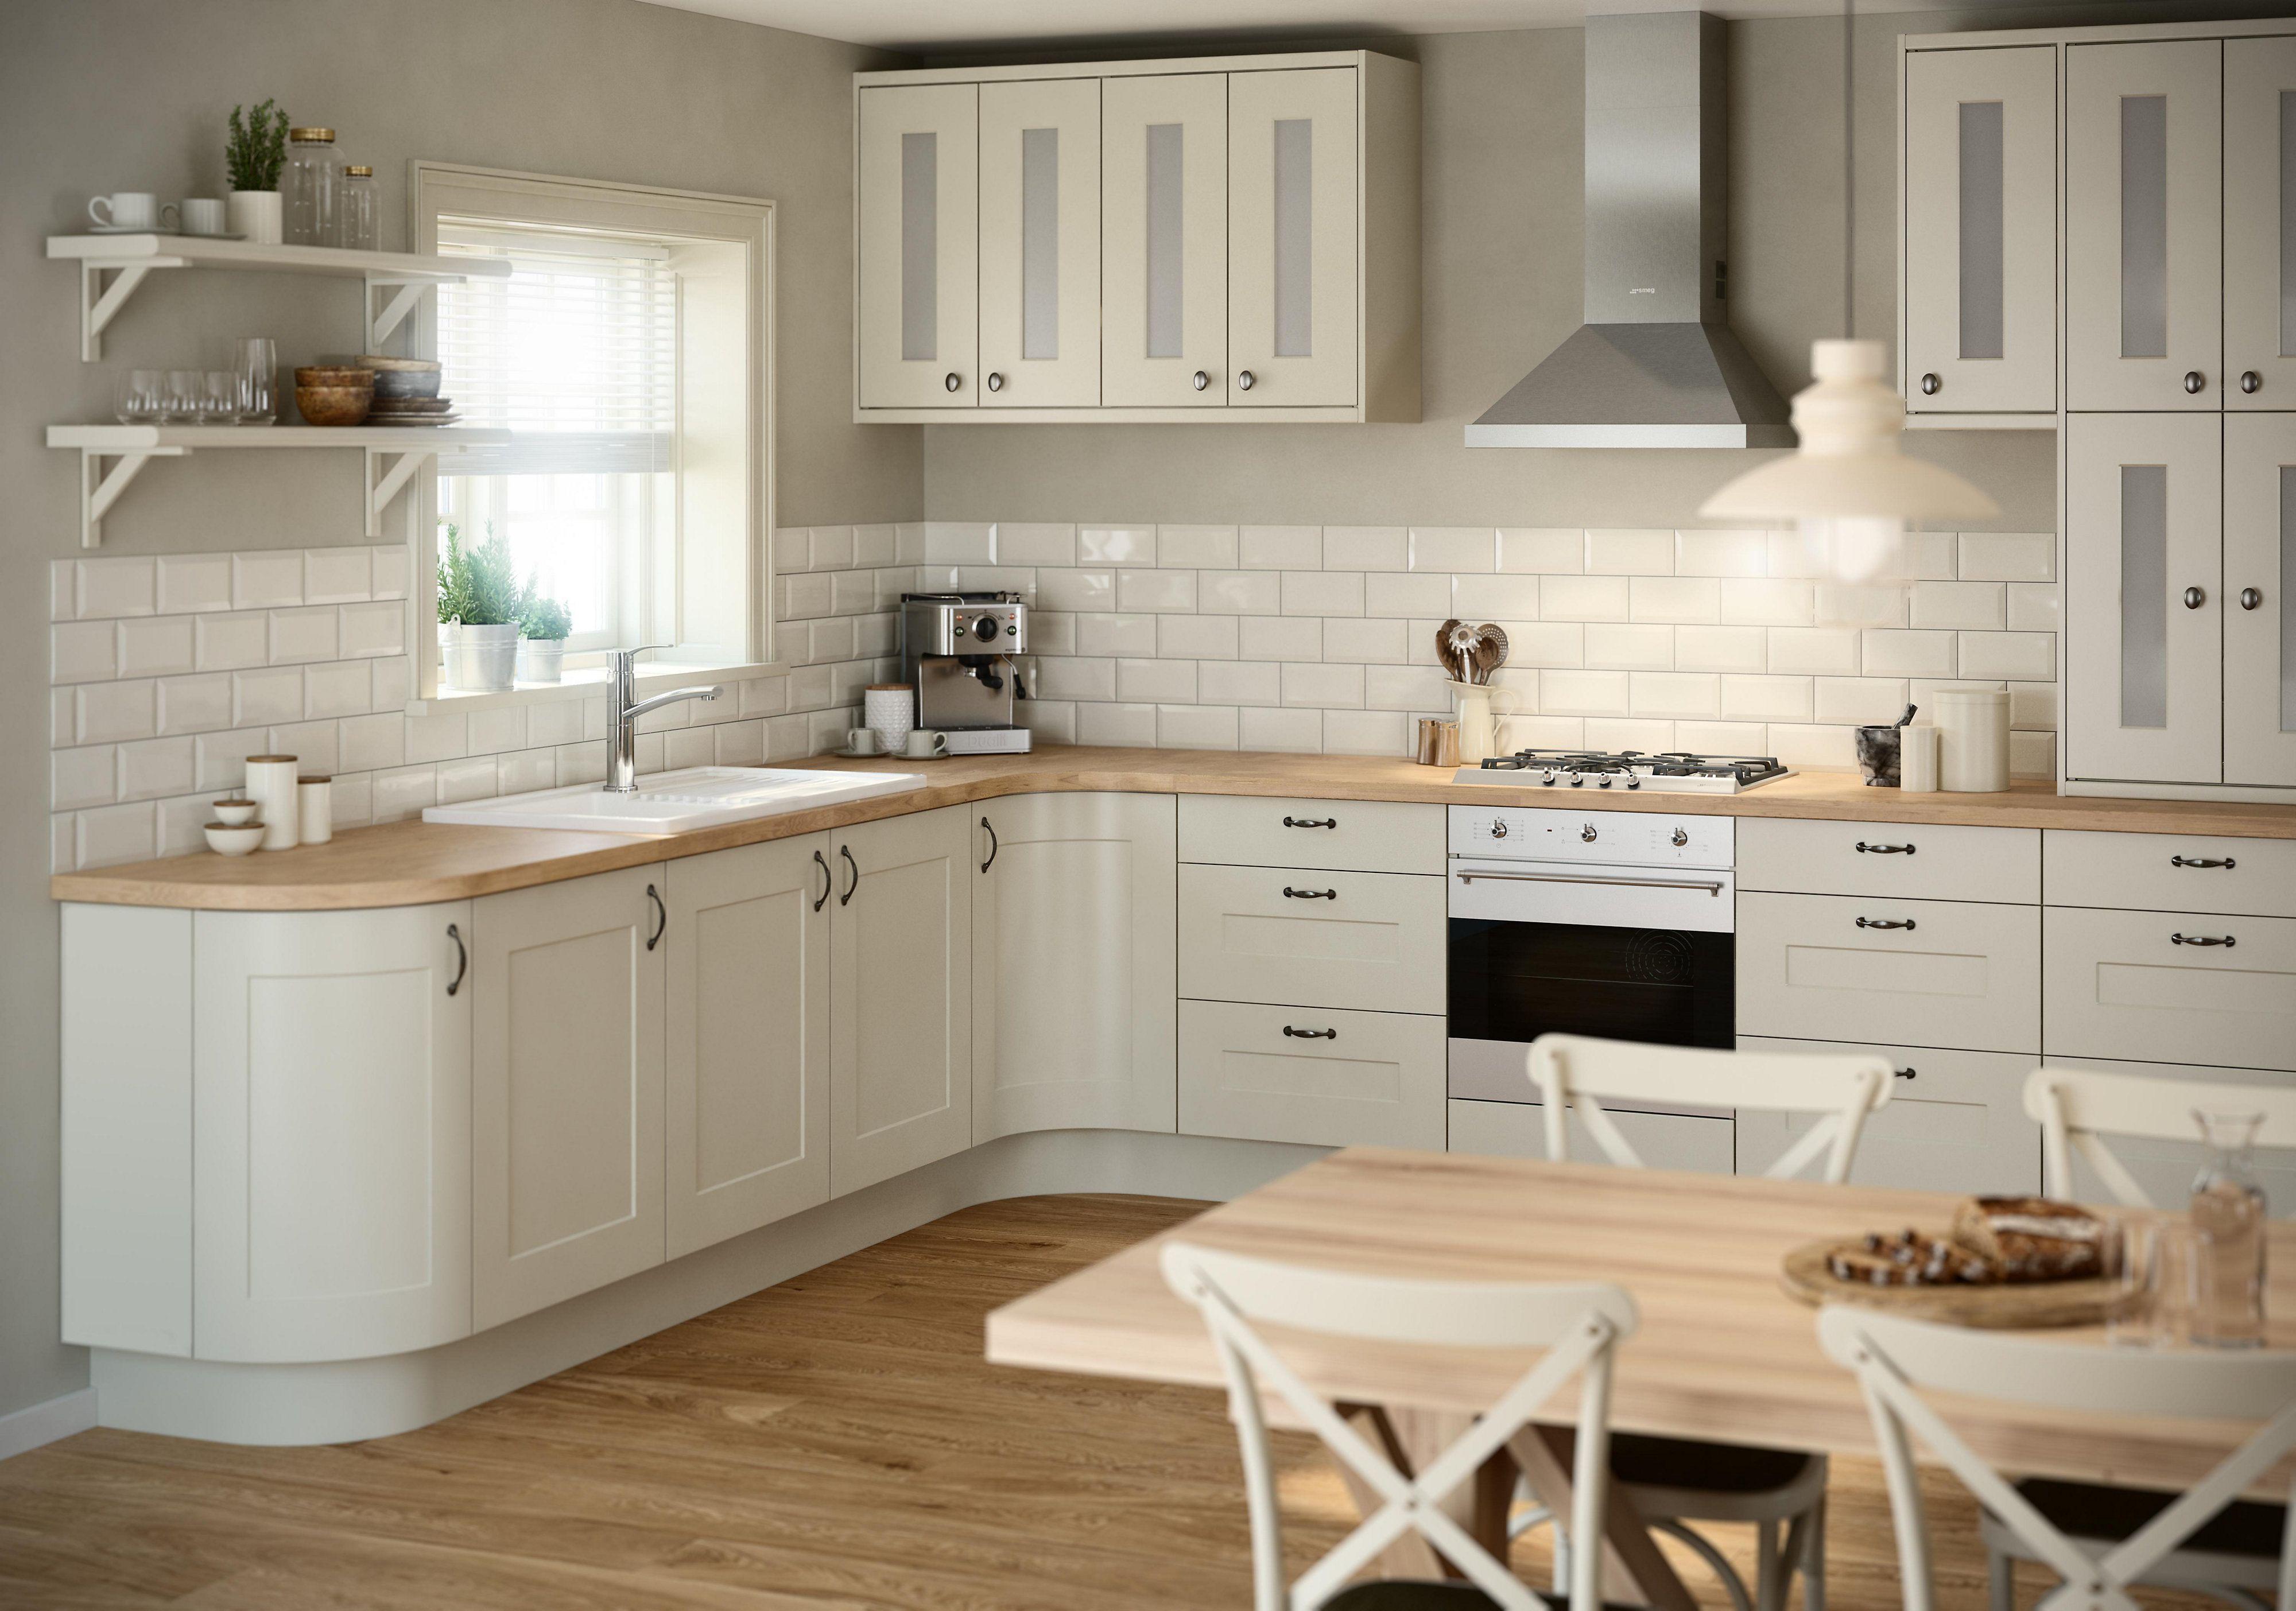 burford grey kitchen range kitchen families howdens joinery